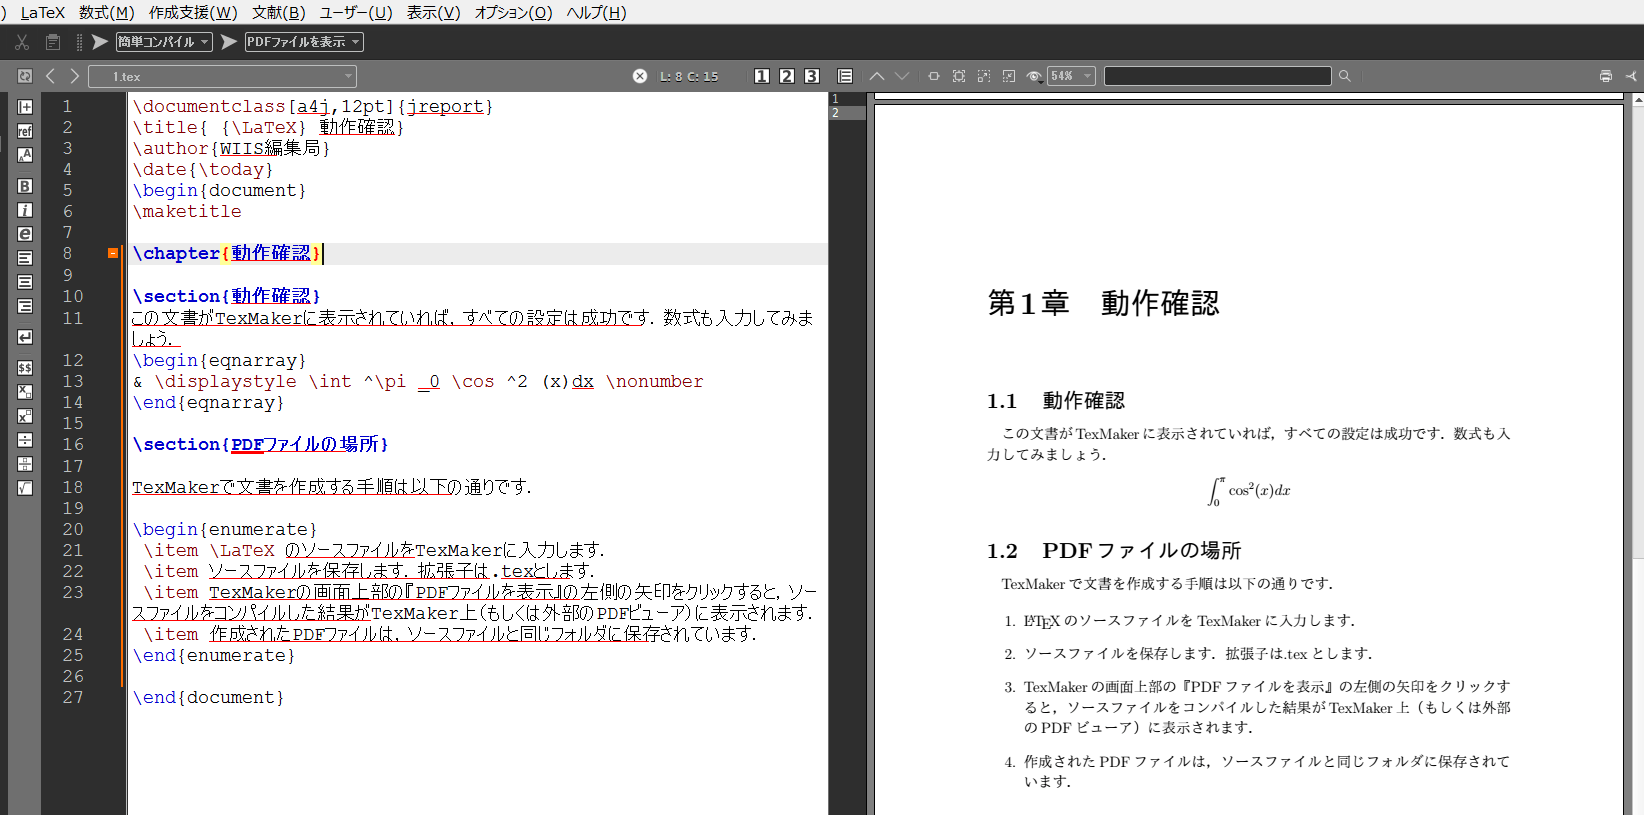 TexMaker による文書作成例